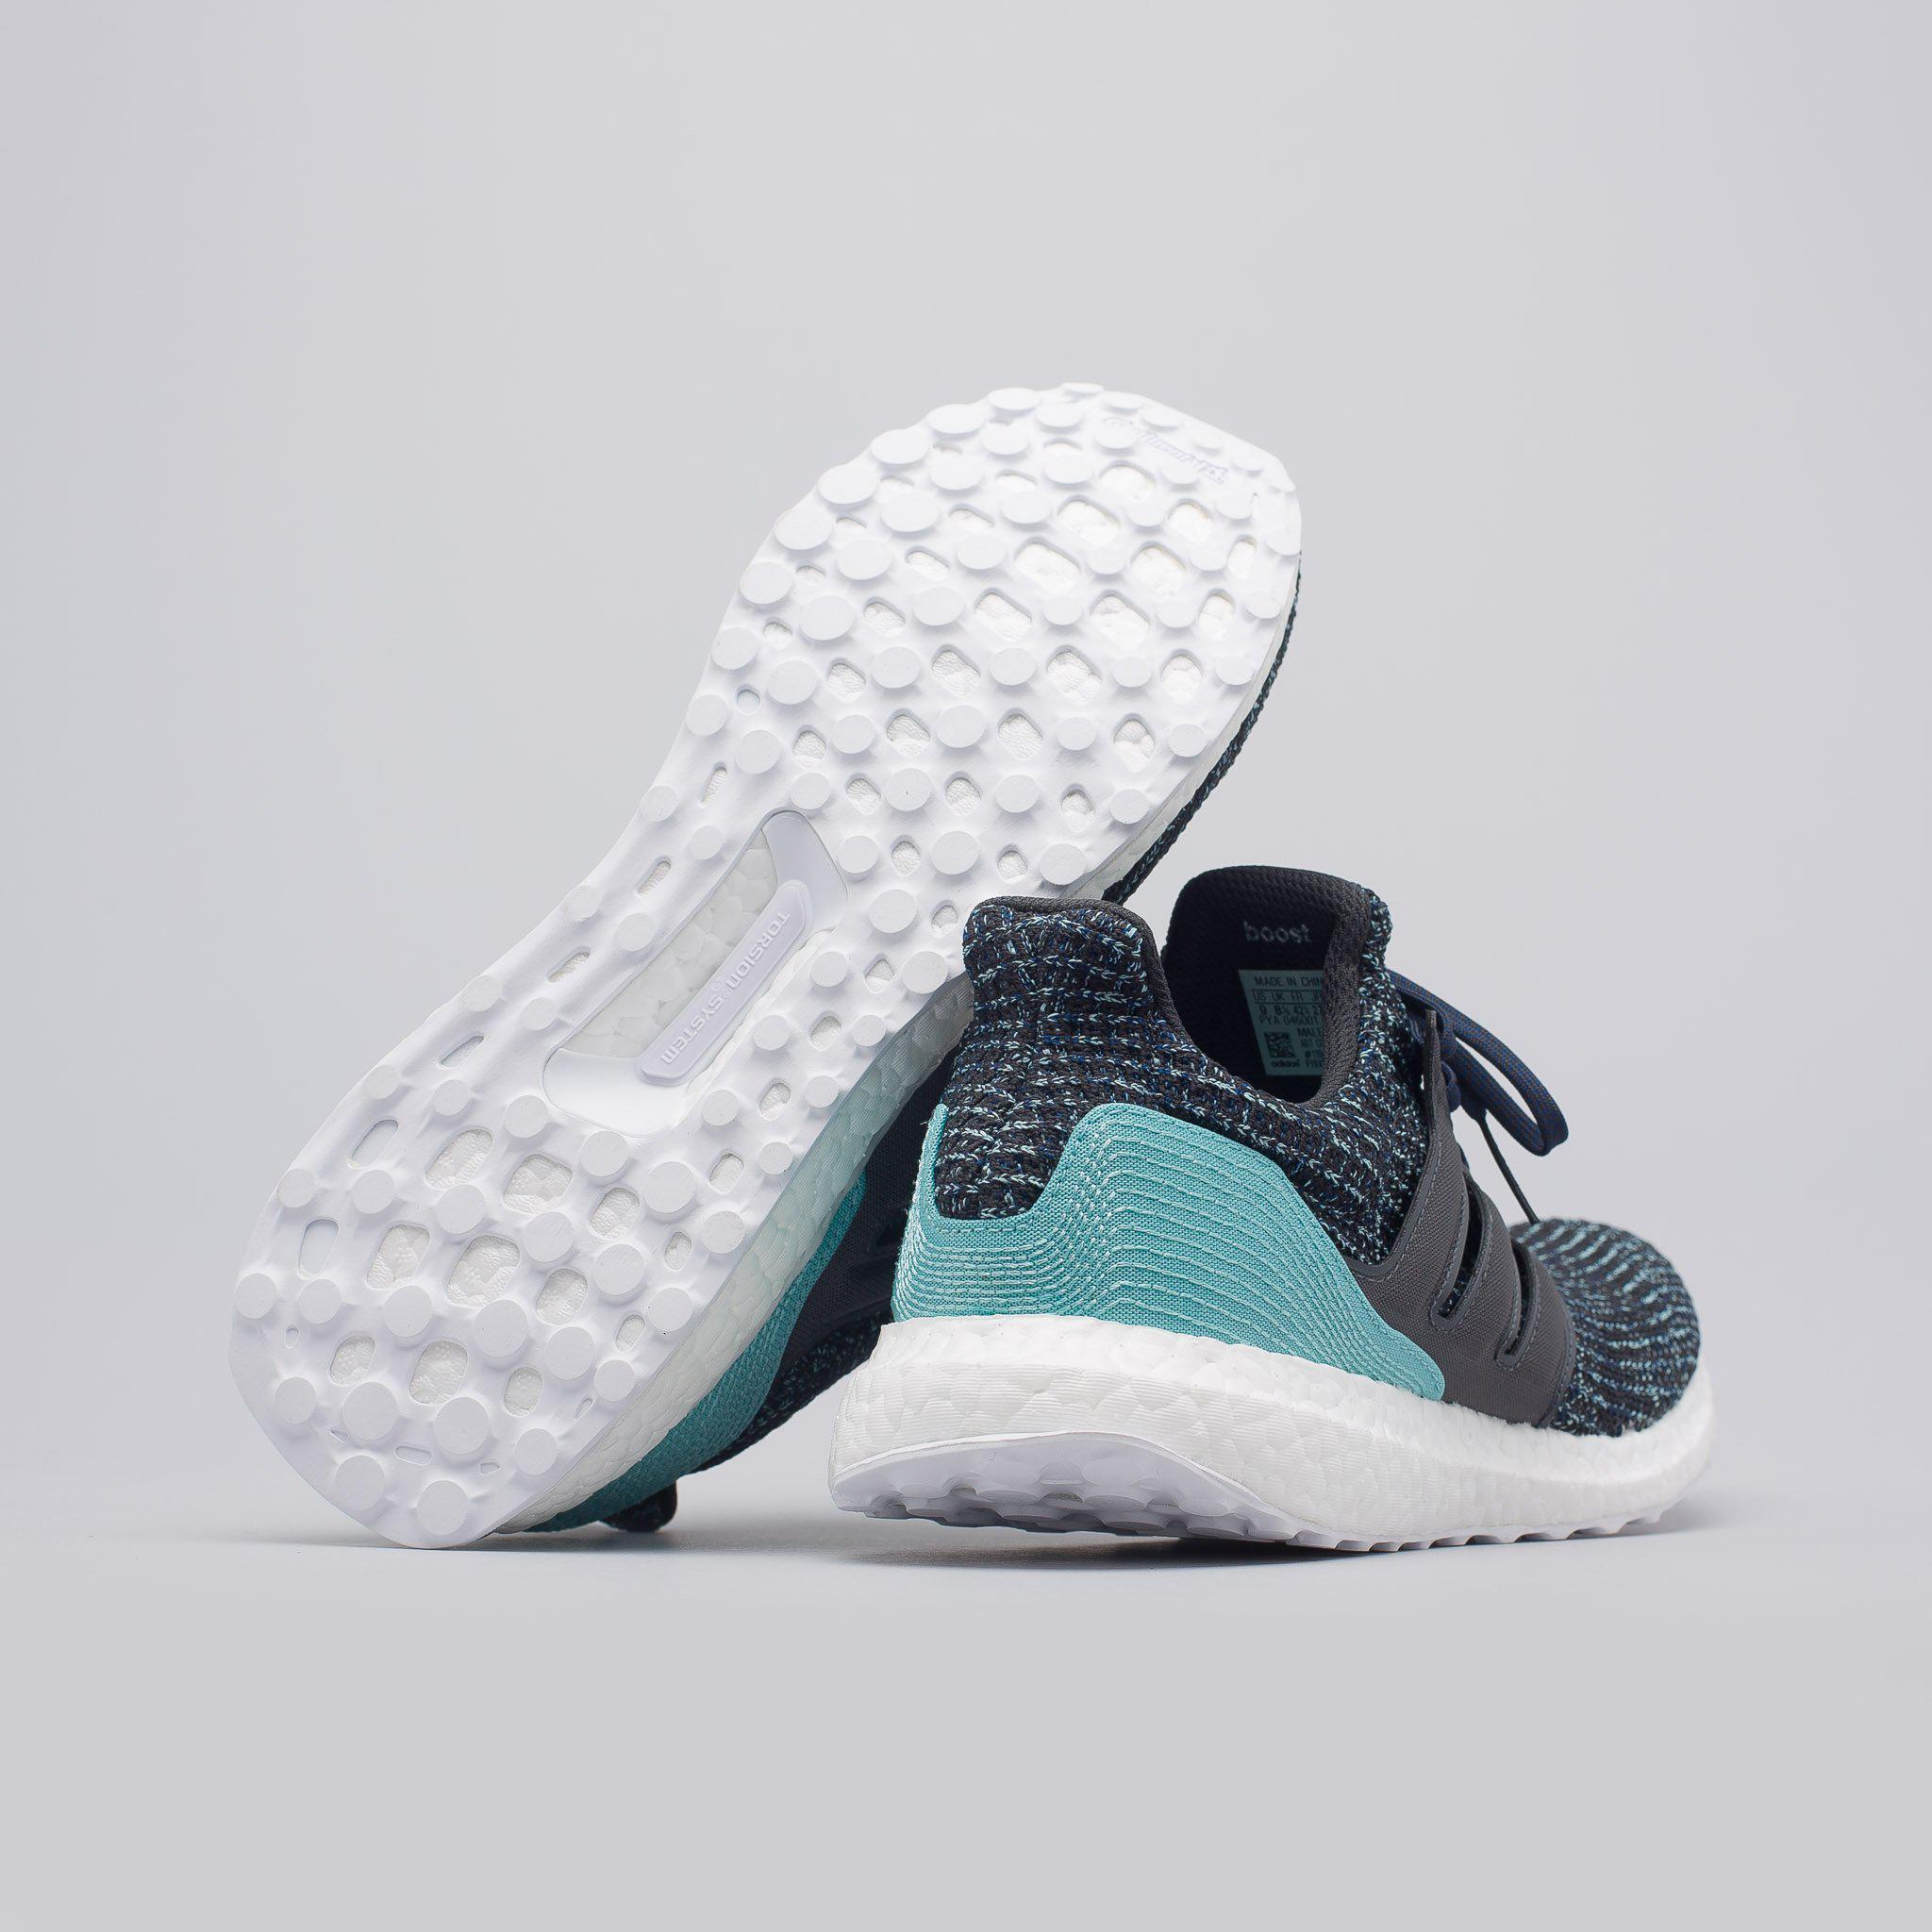 meet fedca a2ae1 Mens Adidas ... online retailer d54e2 5a0d1 Gallery. Mens Adidas ...  official photos c5018 9844f Ultraboost Laceless Parley Shoes Raw Grey  Carbon Blue ...